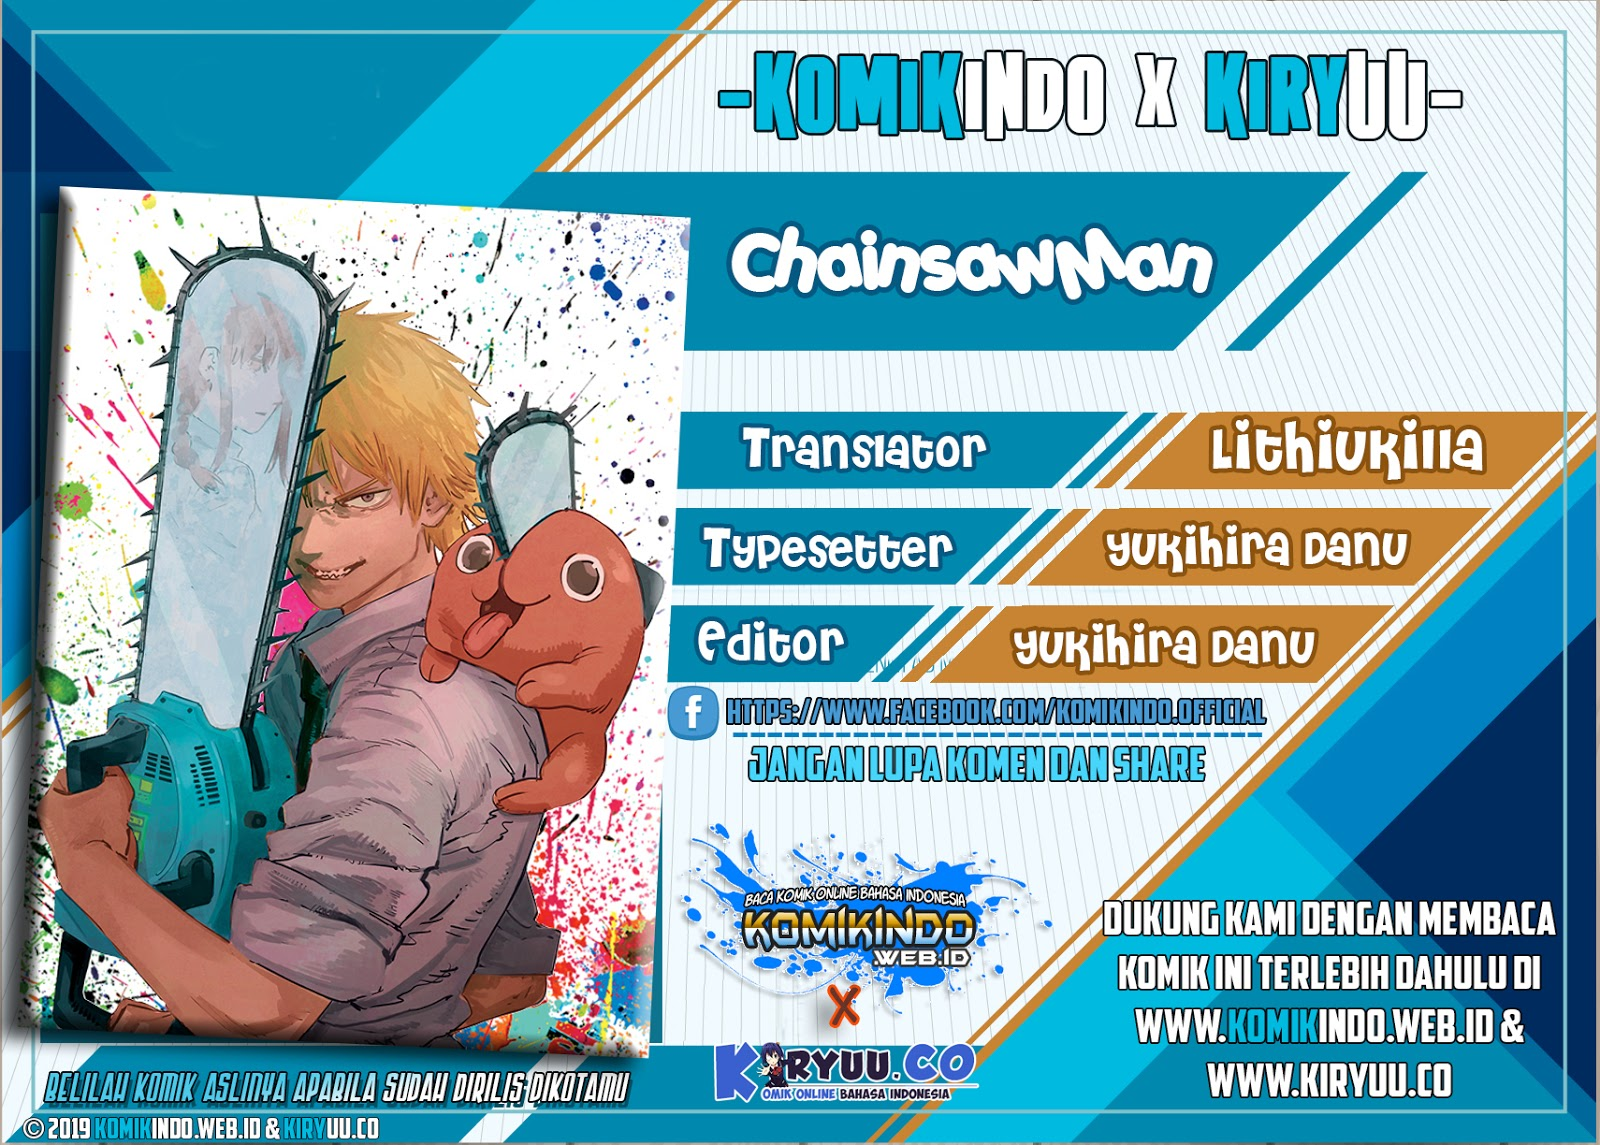 Chainsawman Chapter 13-1